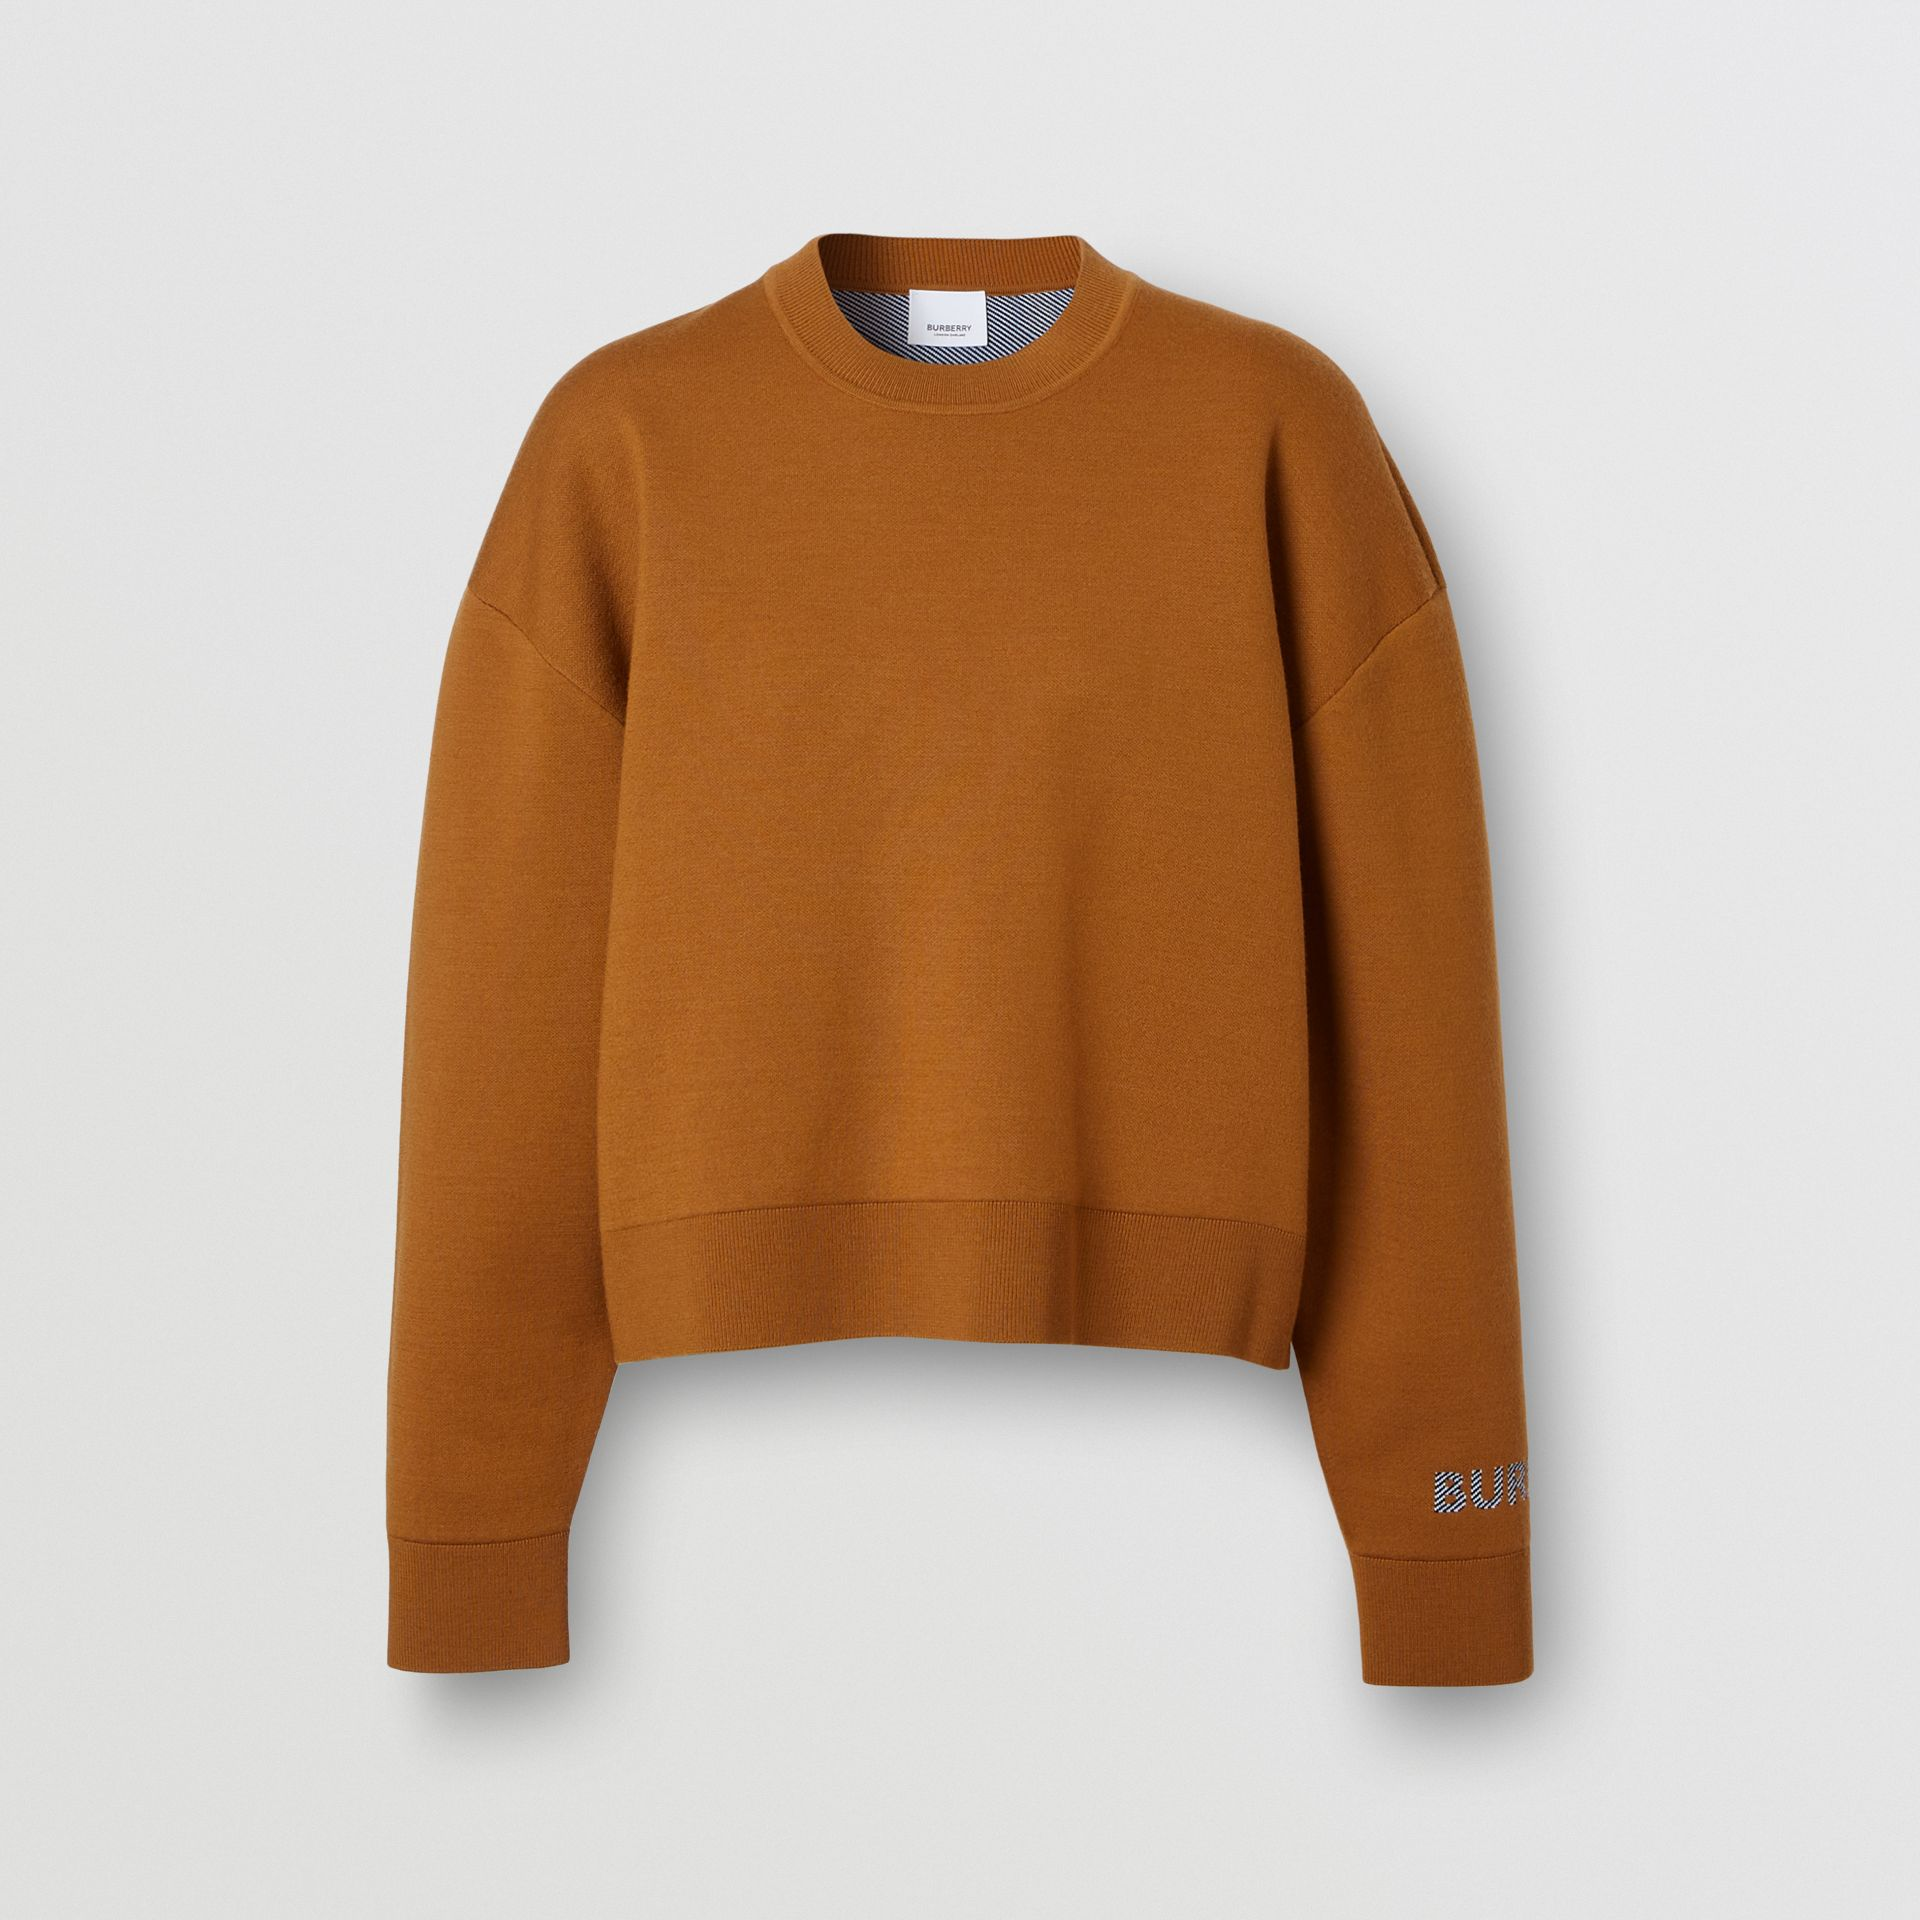 Logo Technical Merino Wool Jacquard Sweater in Chestnut - Women   Burberry - gallery image 3